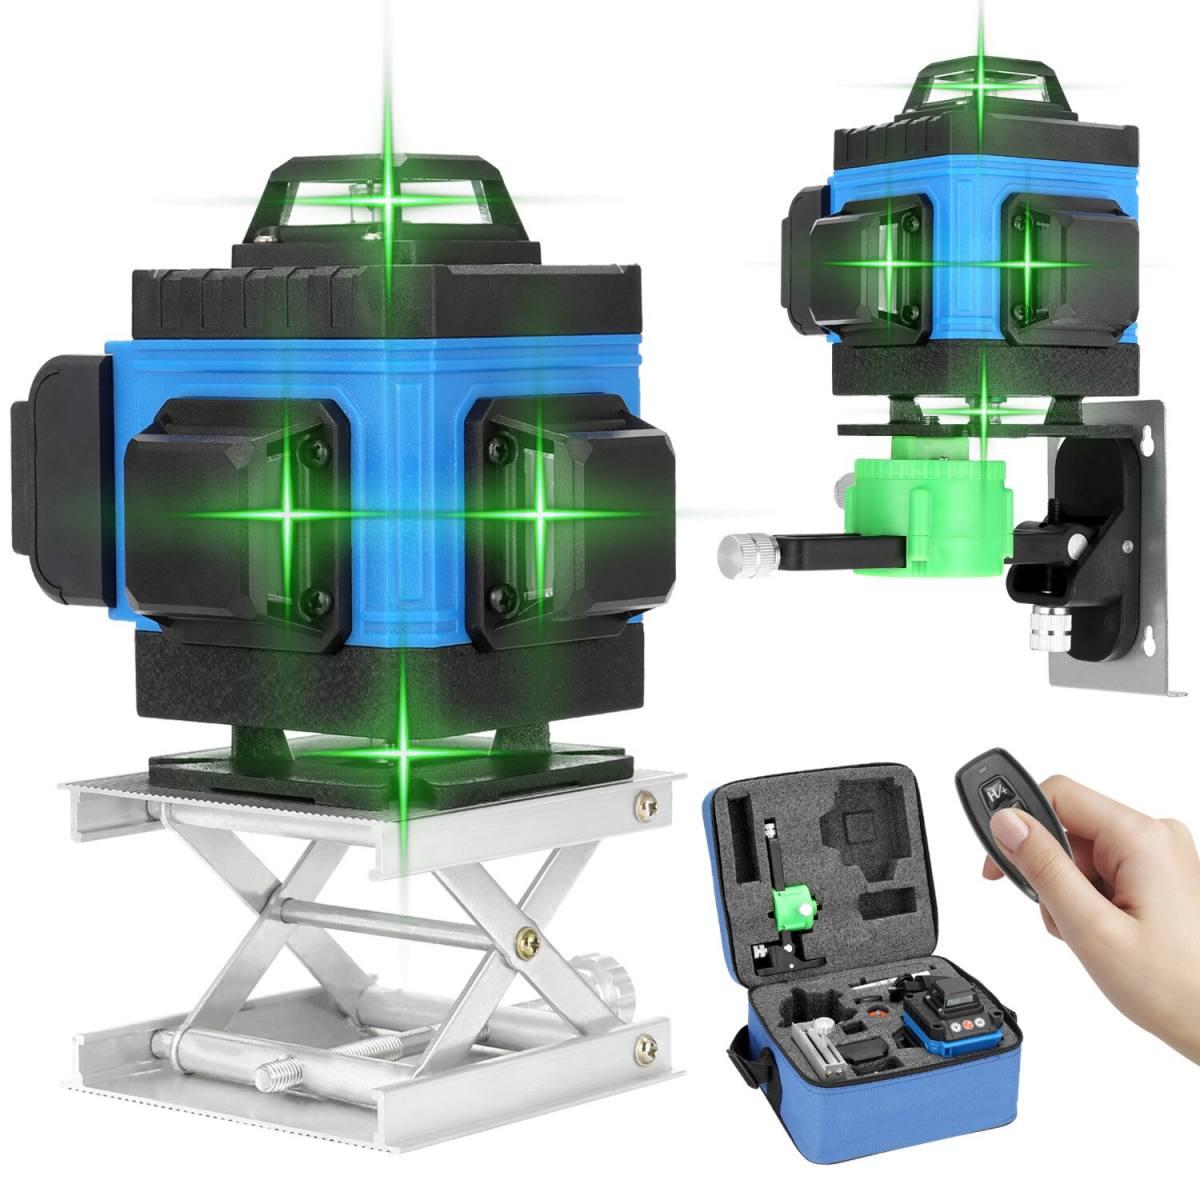 La%CC%81ser verde de 1216 li%CC%81neas 3D 4D autonivelante 360 azul scaled SuperChollos